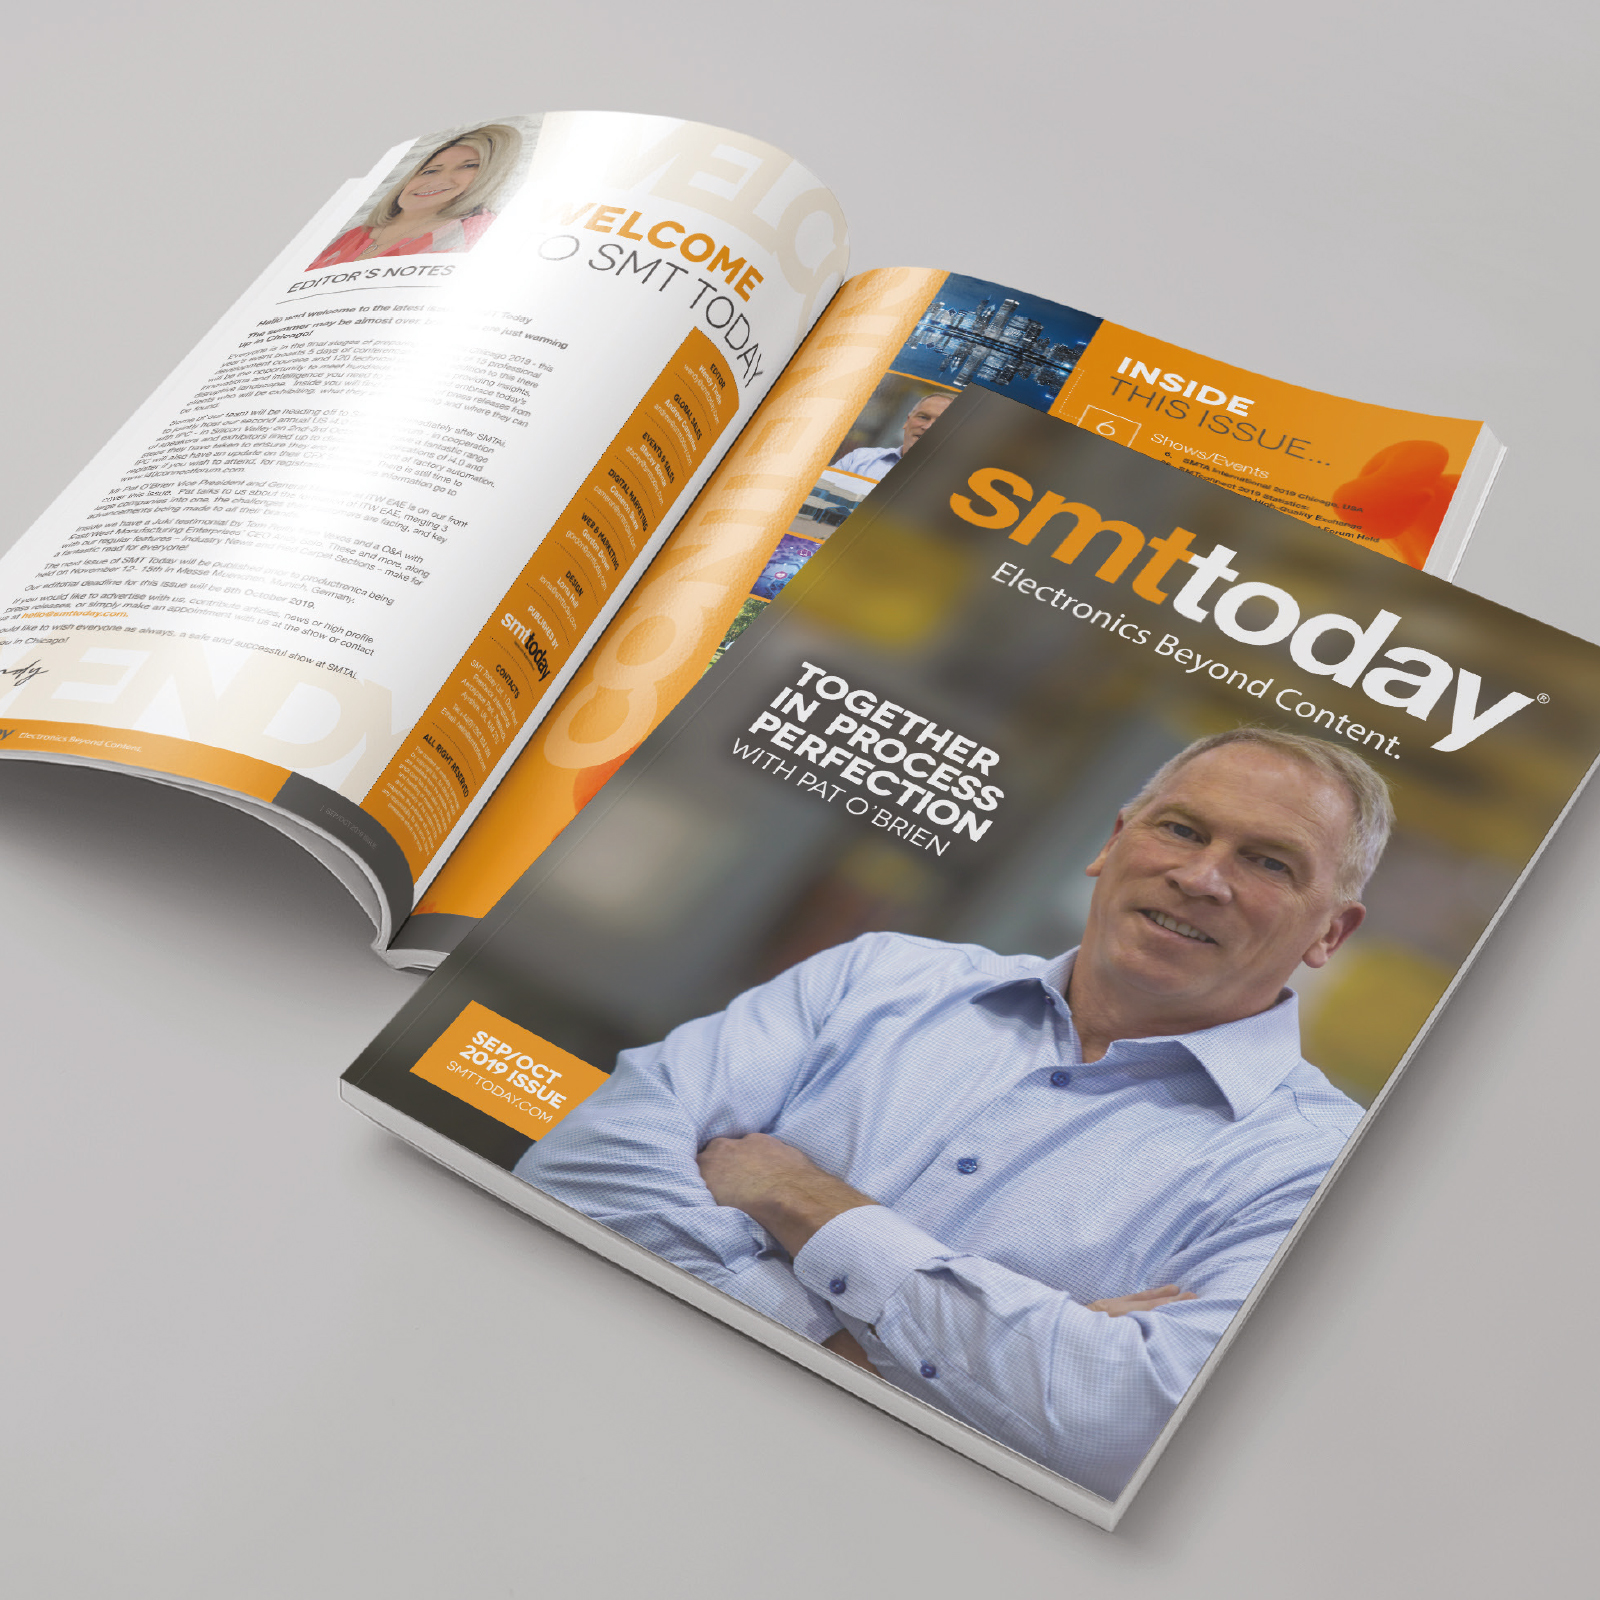 SMT Today magazine